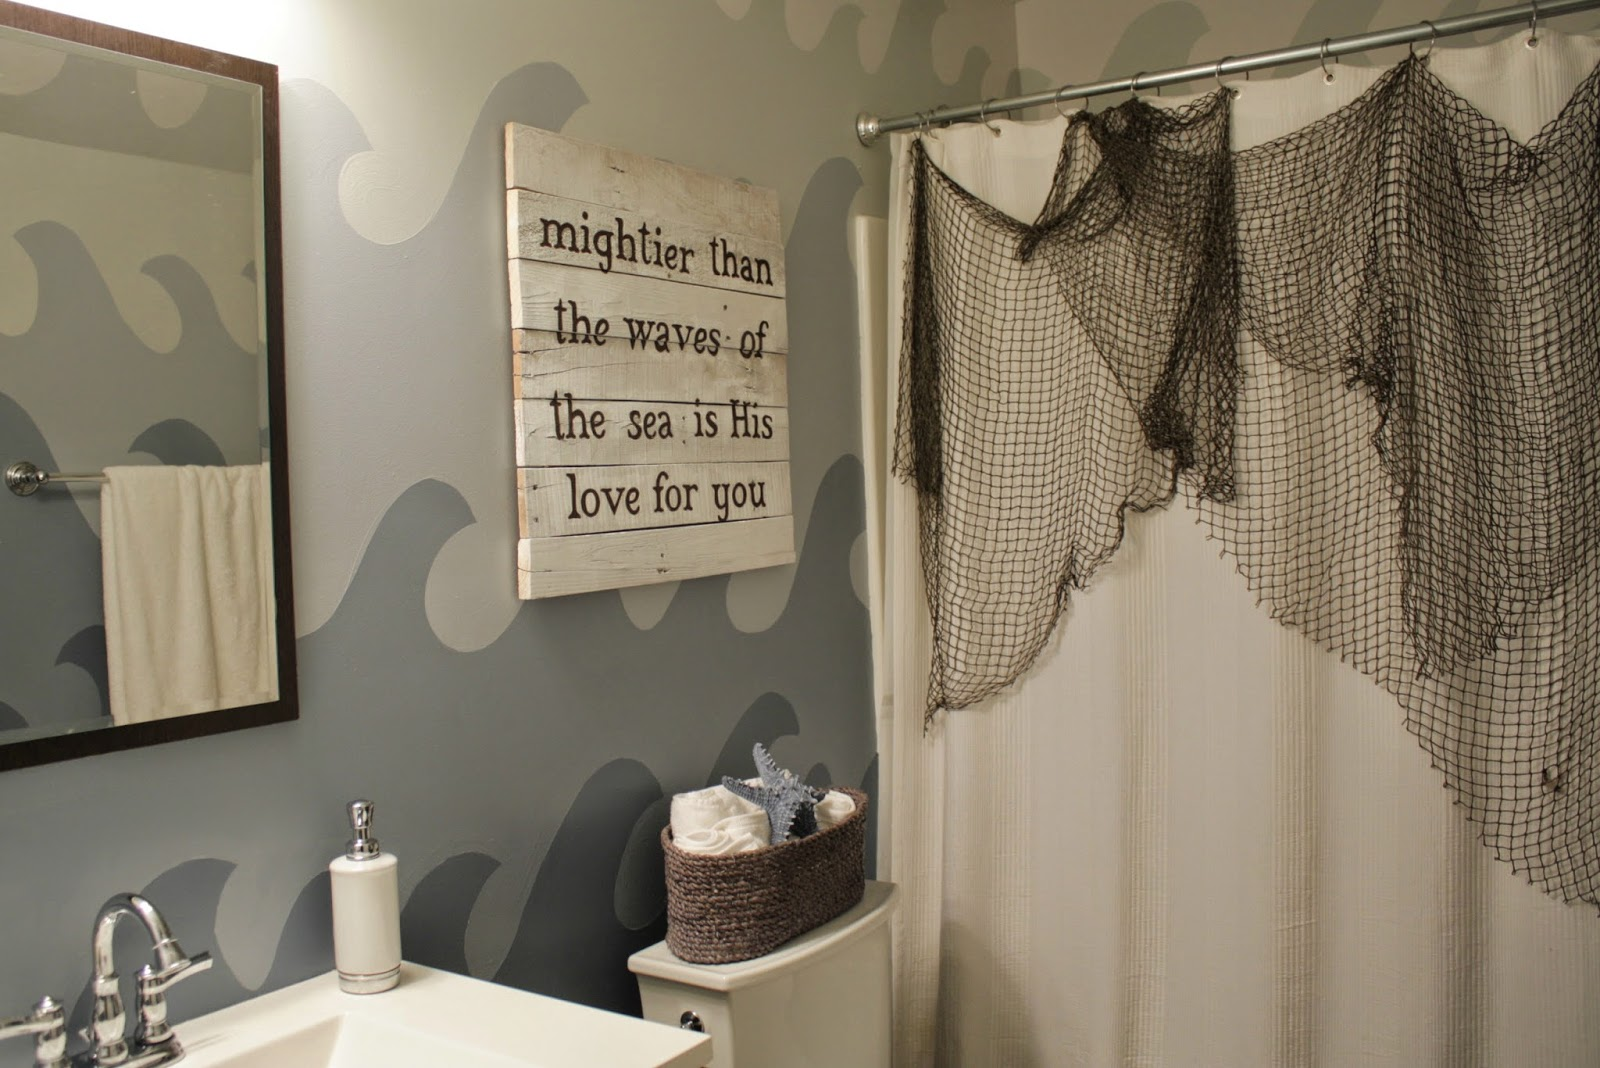 http://www.livealittlewilderblog.com/2014/07/jakes-bathroom-makeover.html